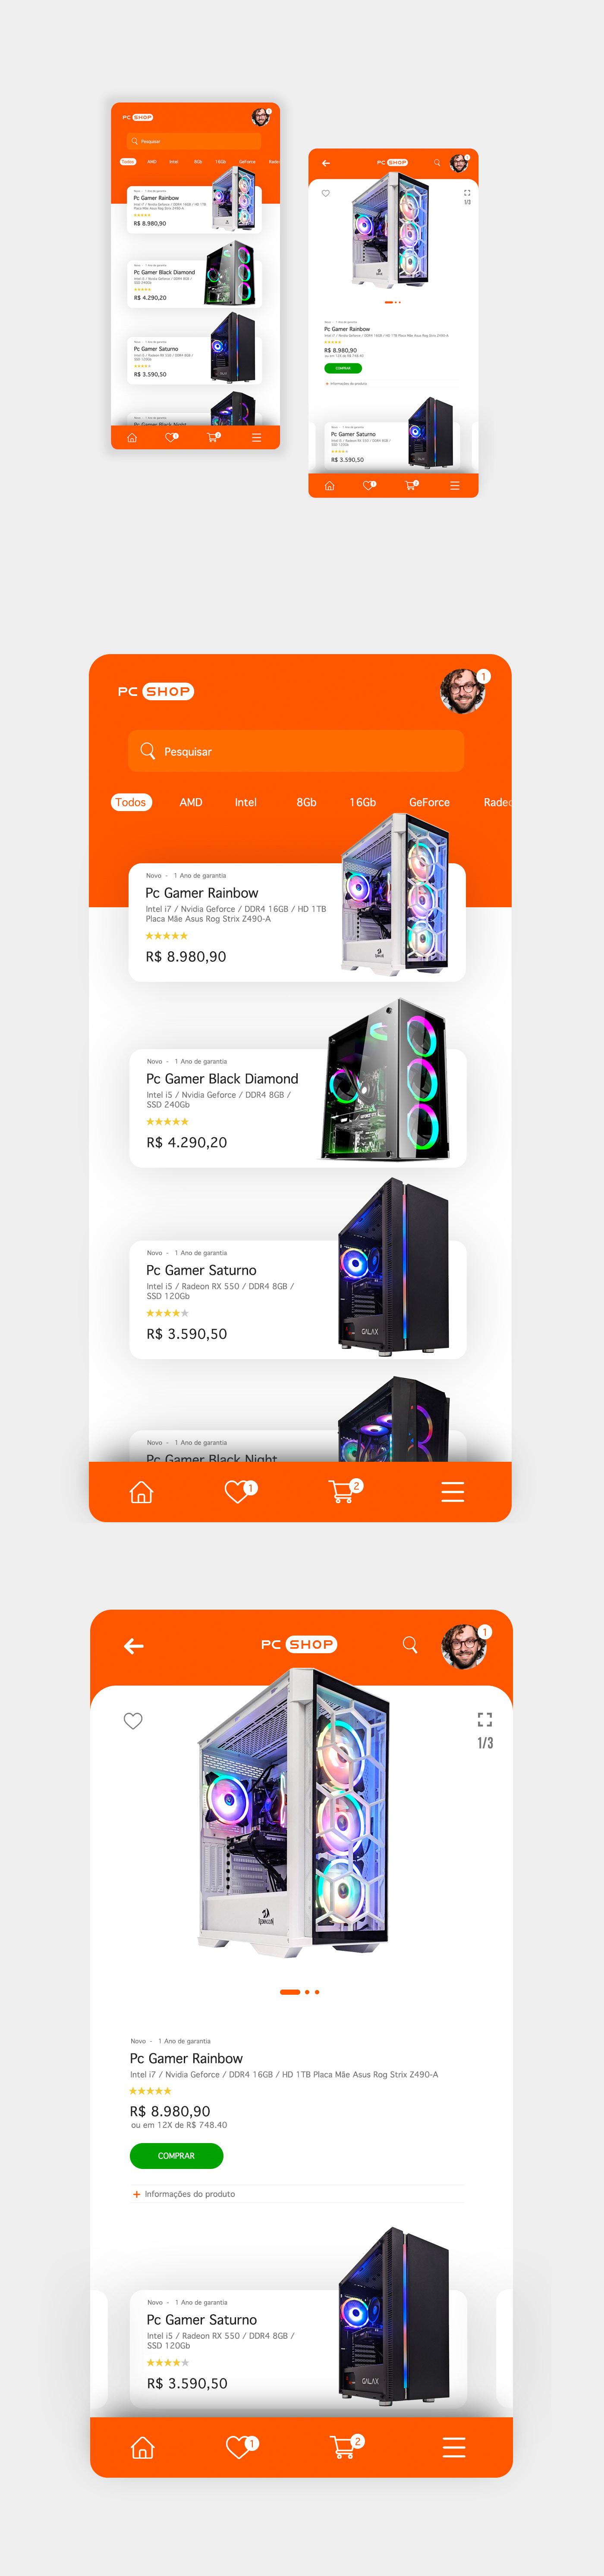 app design Ecommerce Interface pc gamer shop UI ux